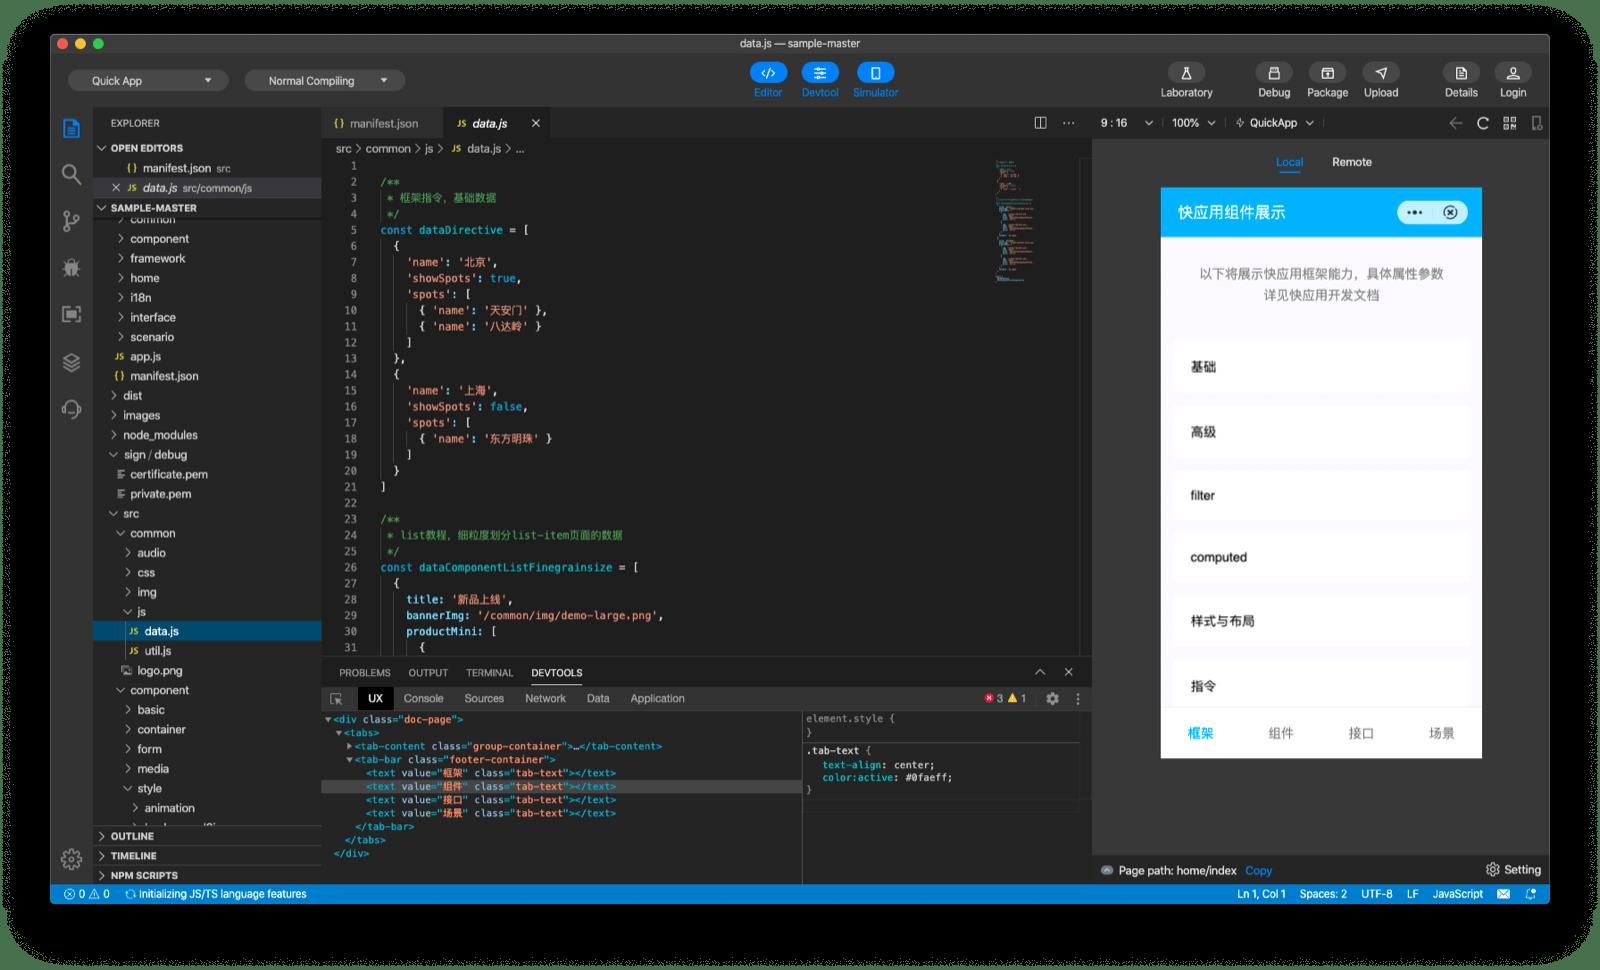 Quick App DevTools application window showing code editor, simulator, and debugger.